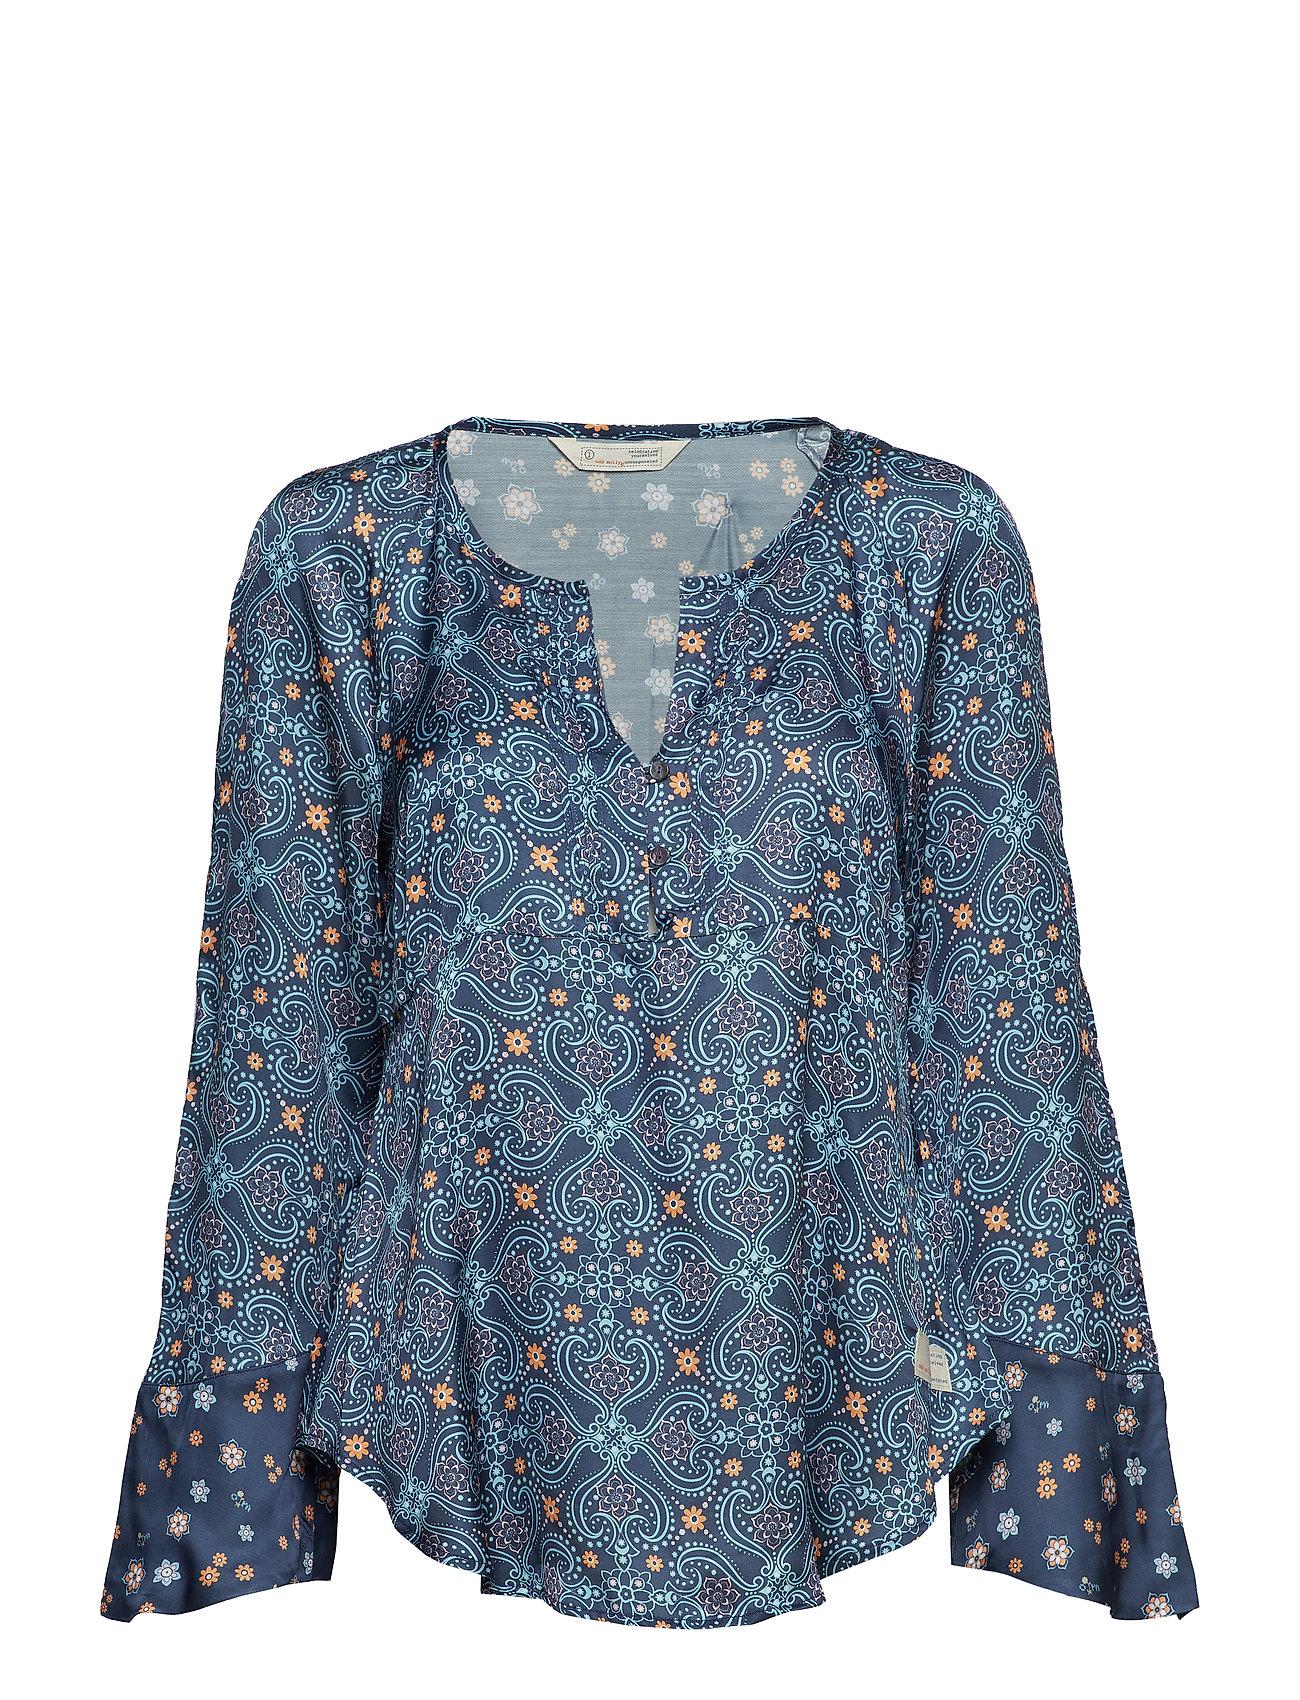 ODD MOLLY unsilent night blouse - TRUE BLUE